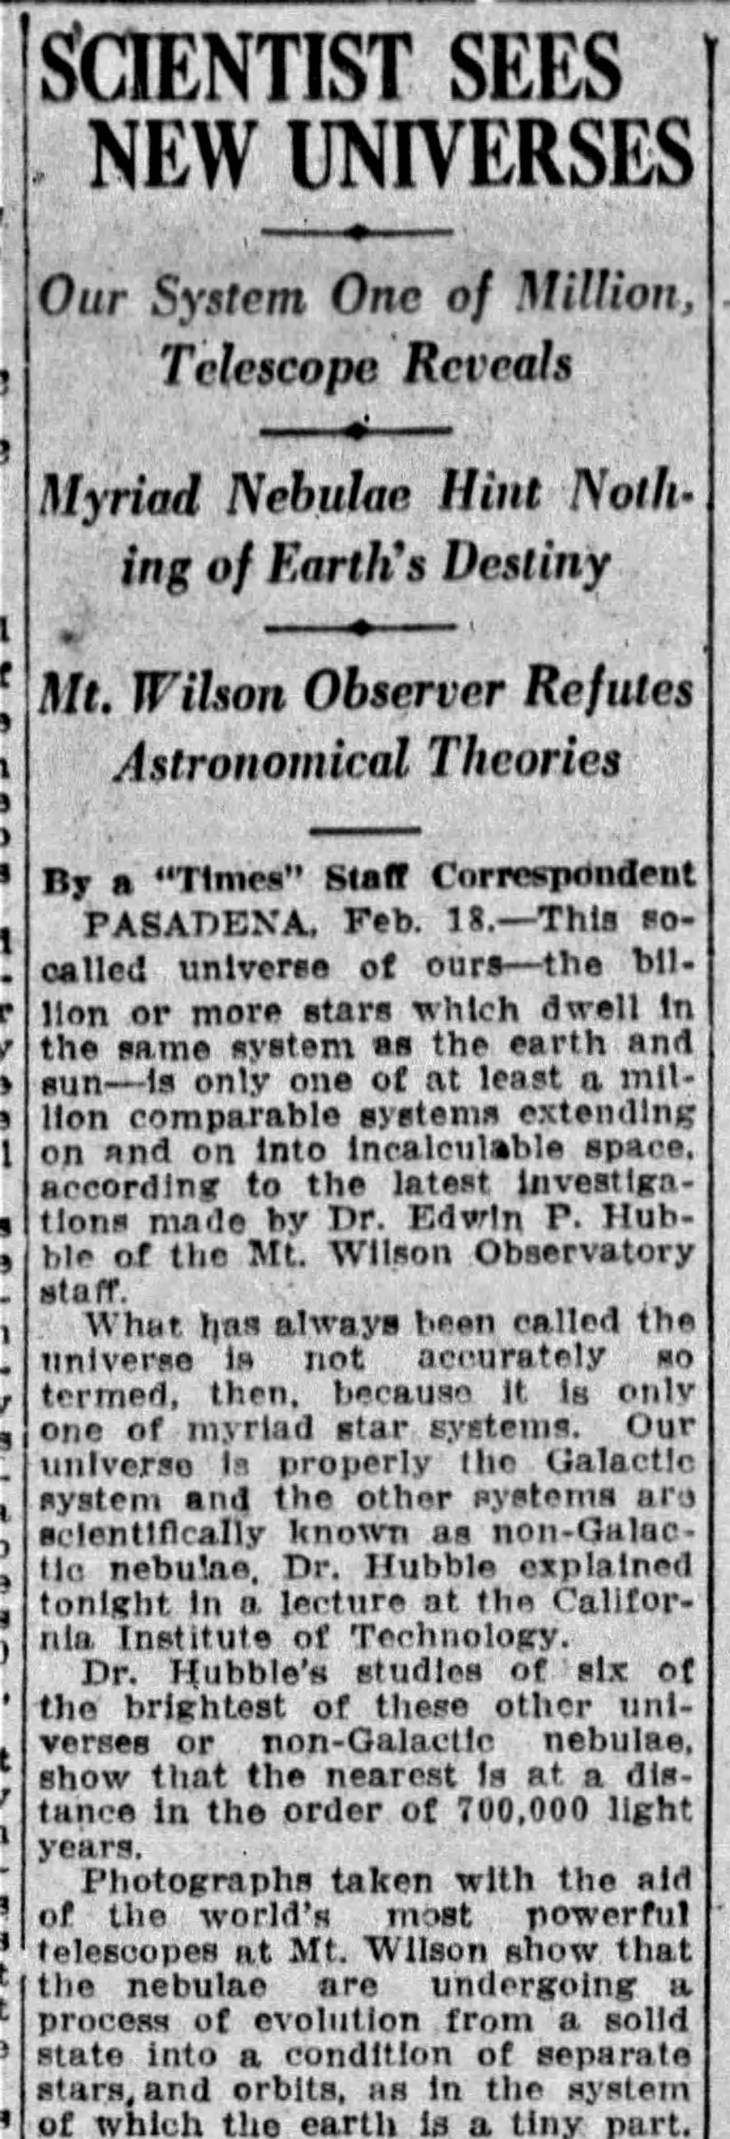 Hubble New Universes Times_Feb_19__1926_